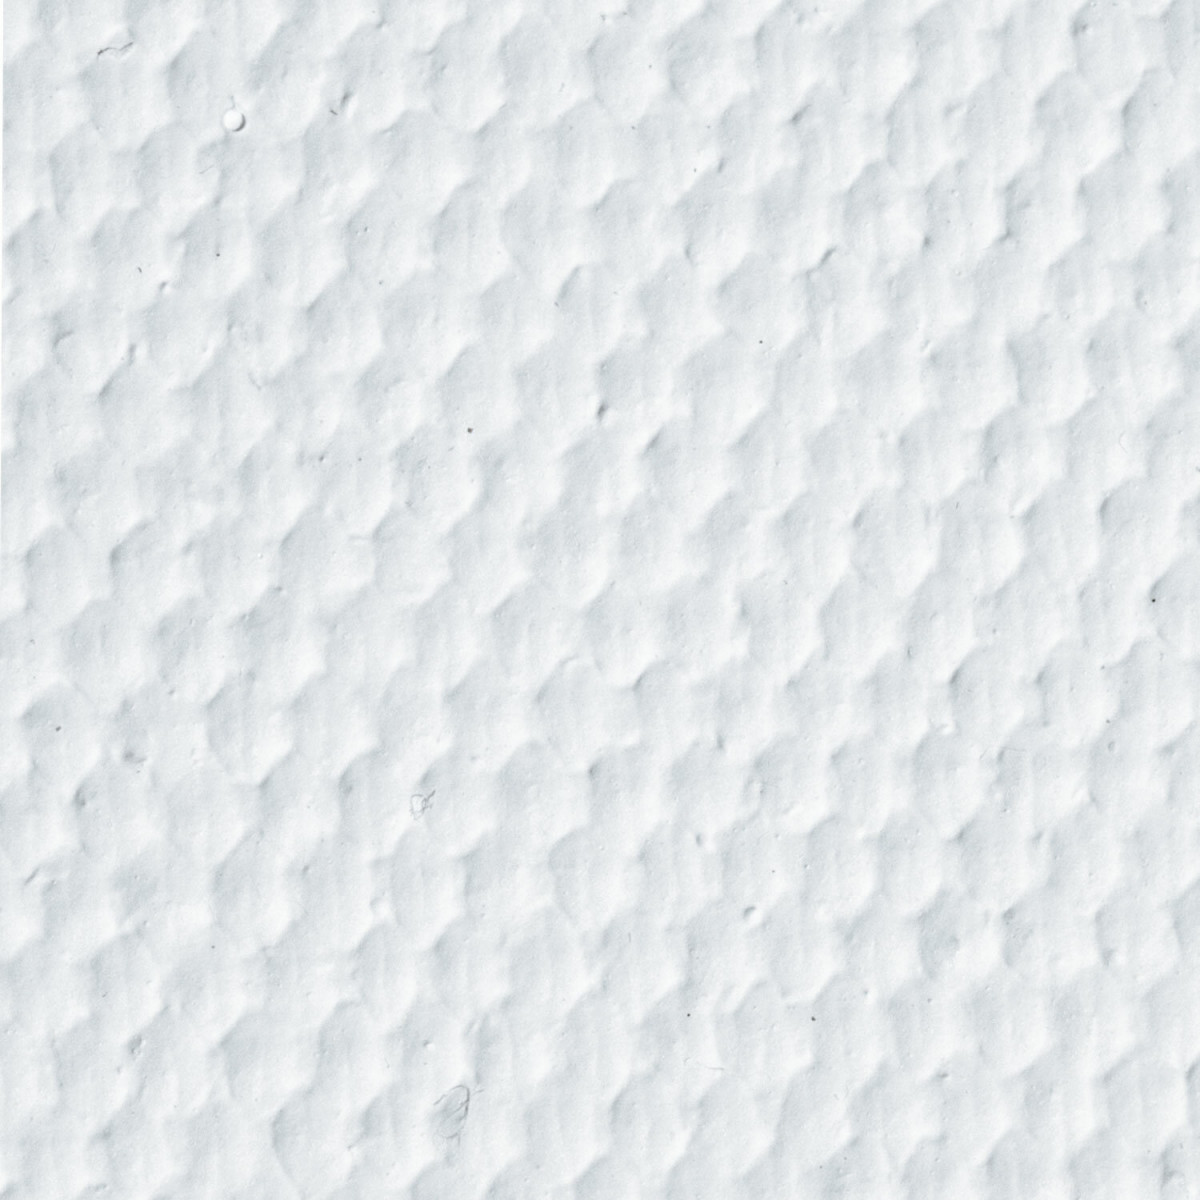 "Холст на картоне с контуром BRAUBERG ART ""CLASSIC"", ""Фрукты"", 30х40 см, грунтованный, 100% хлопок, 190634 (арт. 190634)"